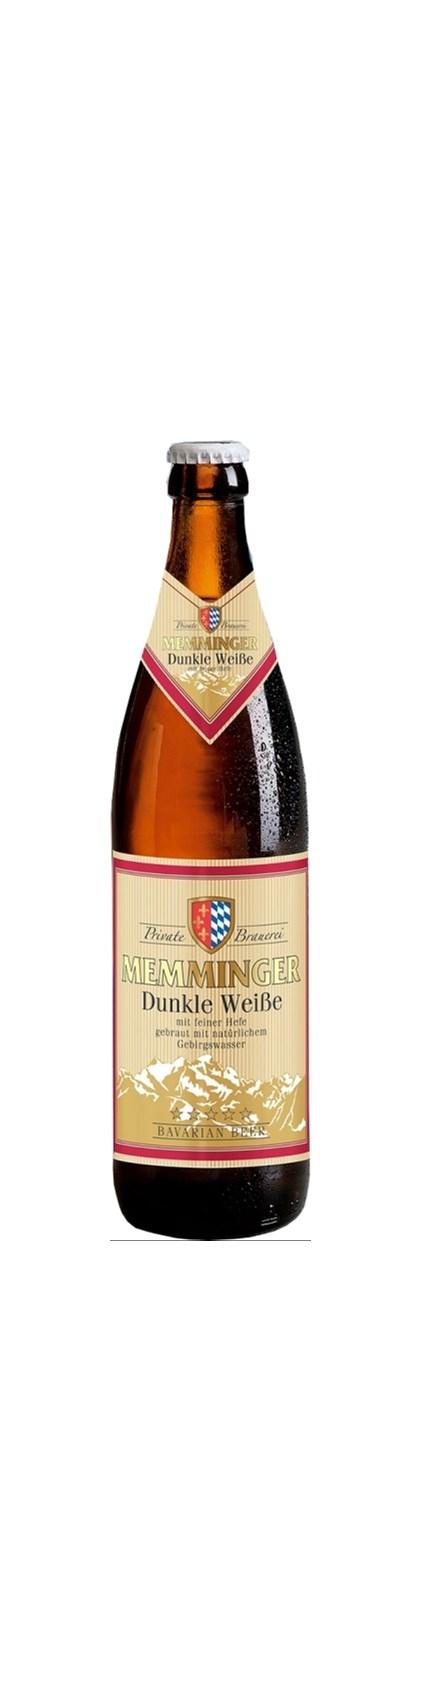 Memminger Dunkle Weisse